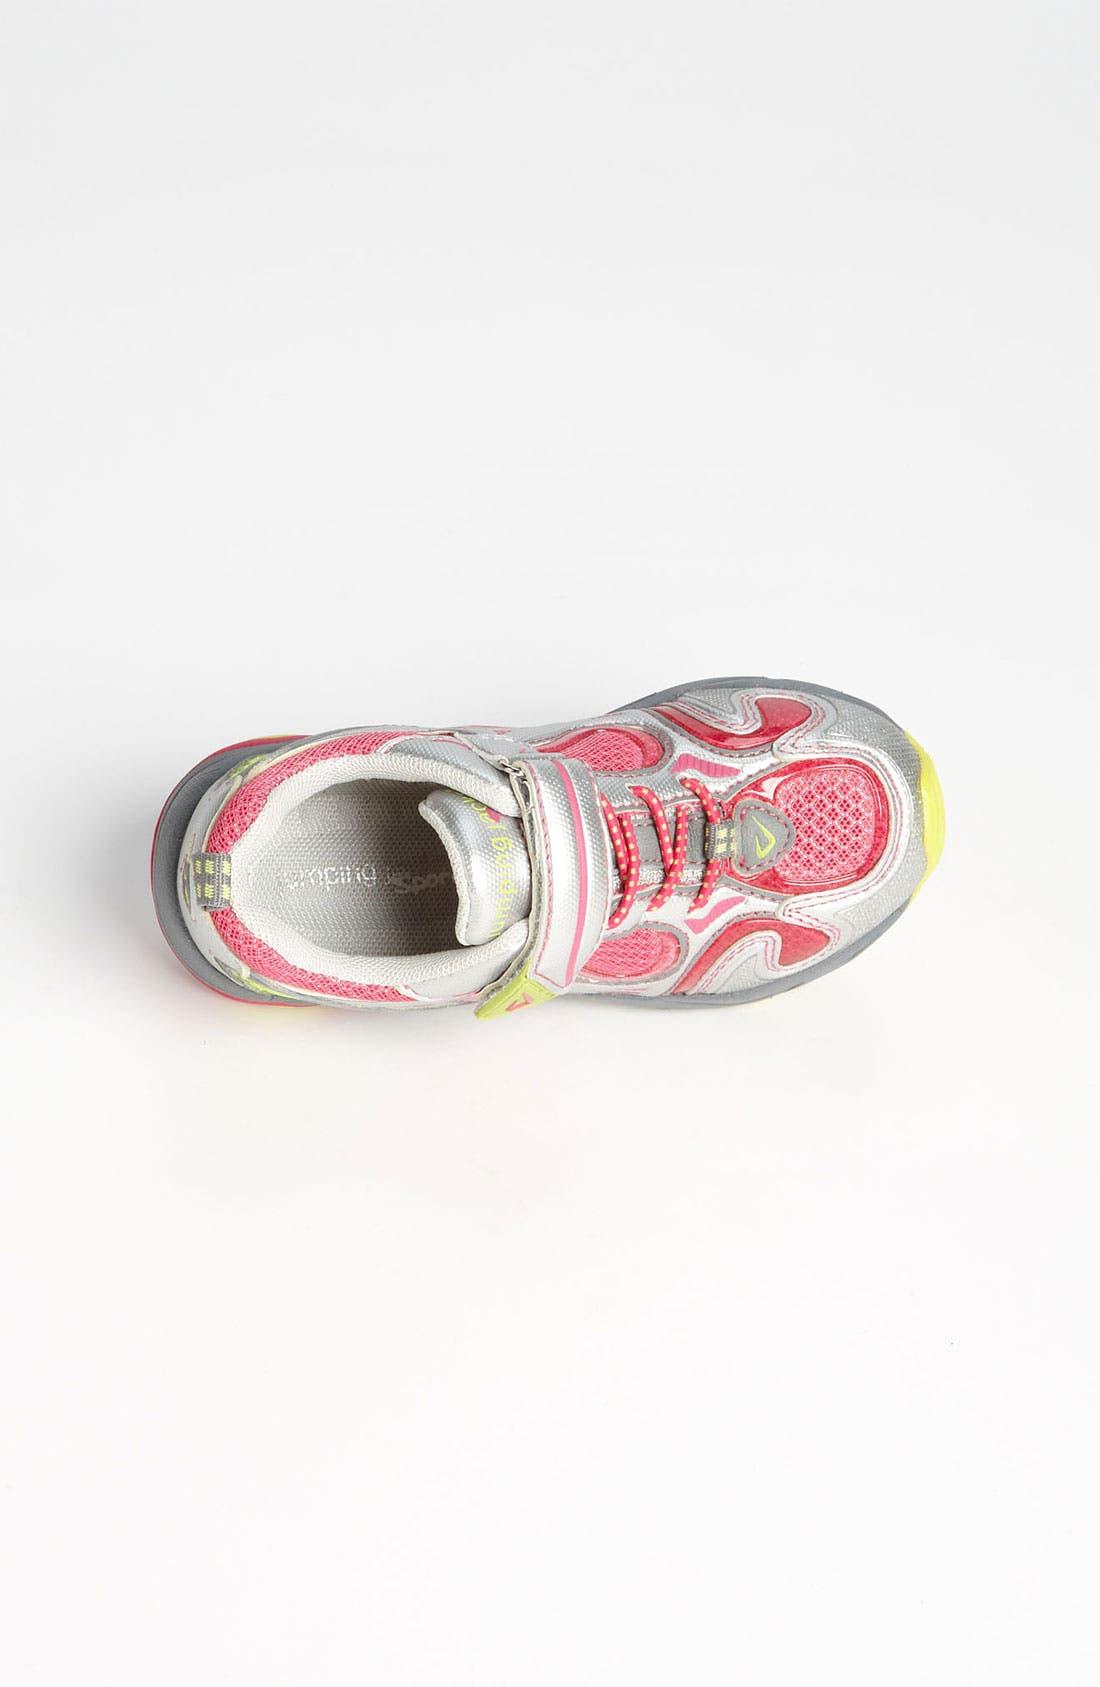 Alternate Image 3  - Jumping Jacks 'Turtle Tuff' Sneaker (Toddler, Little Kid & Big Kid)